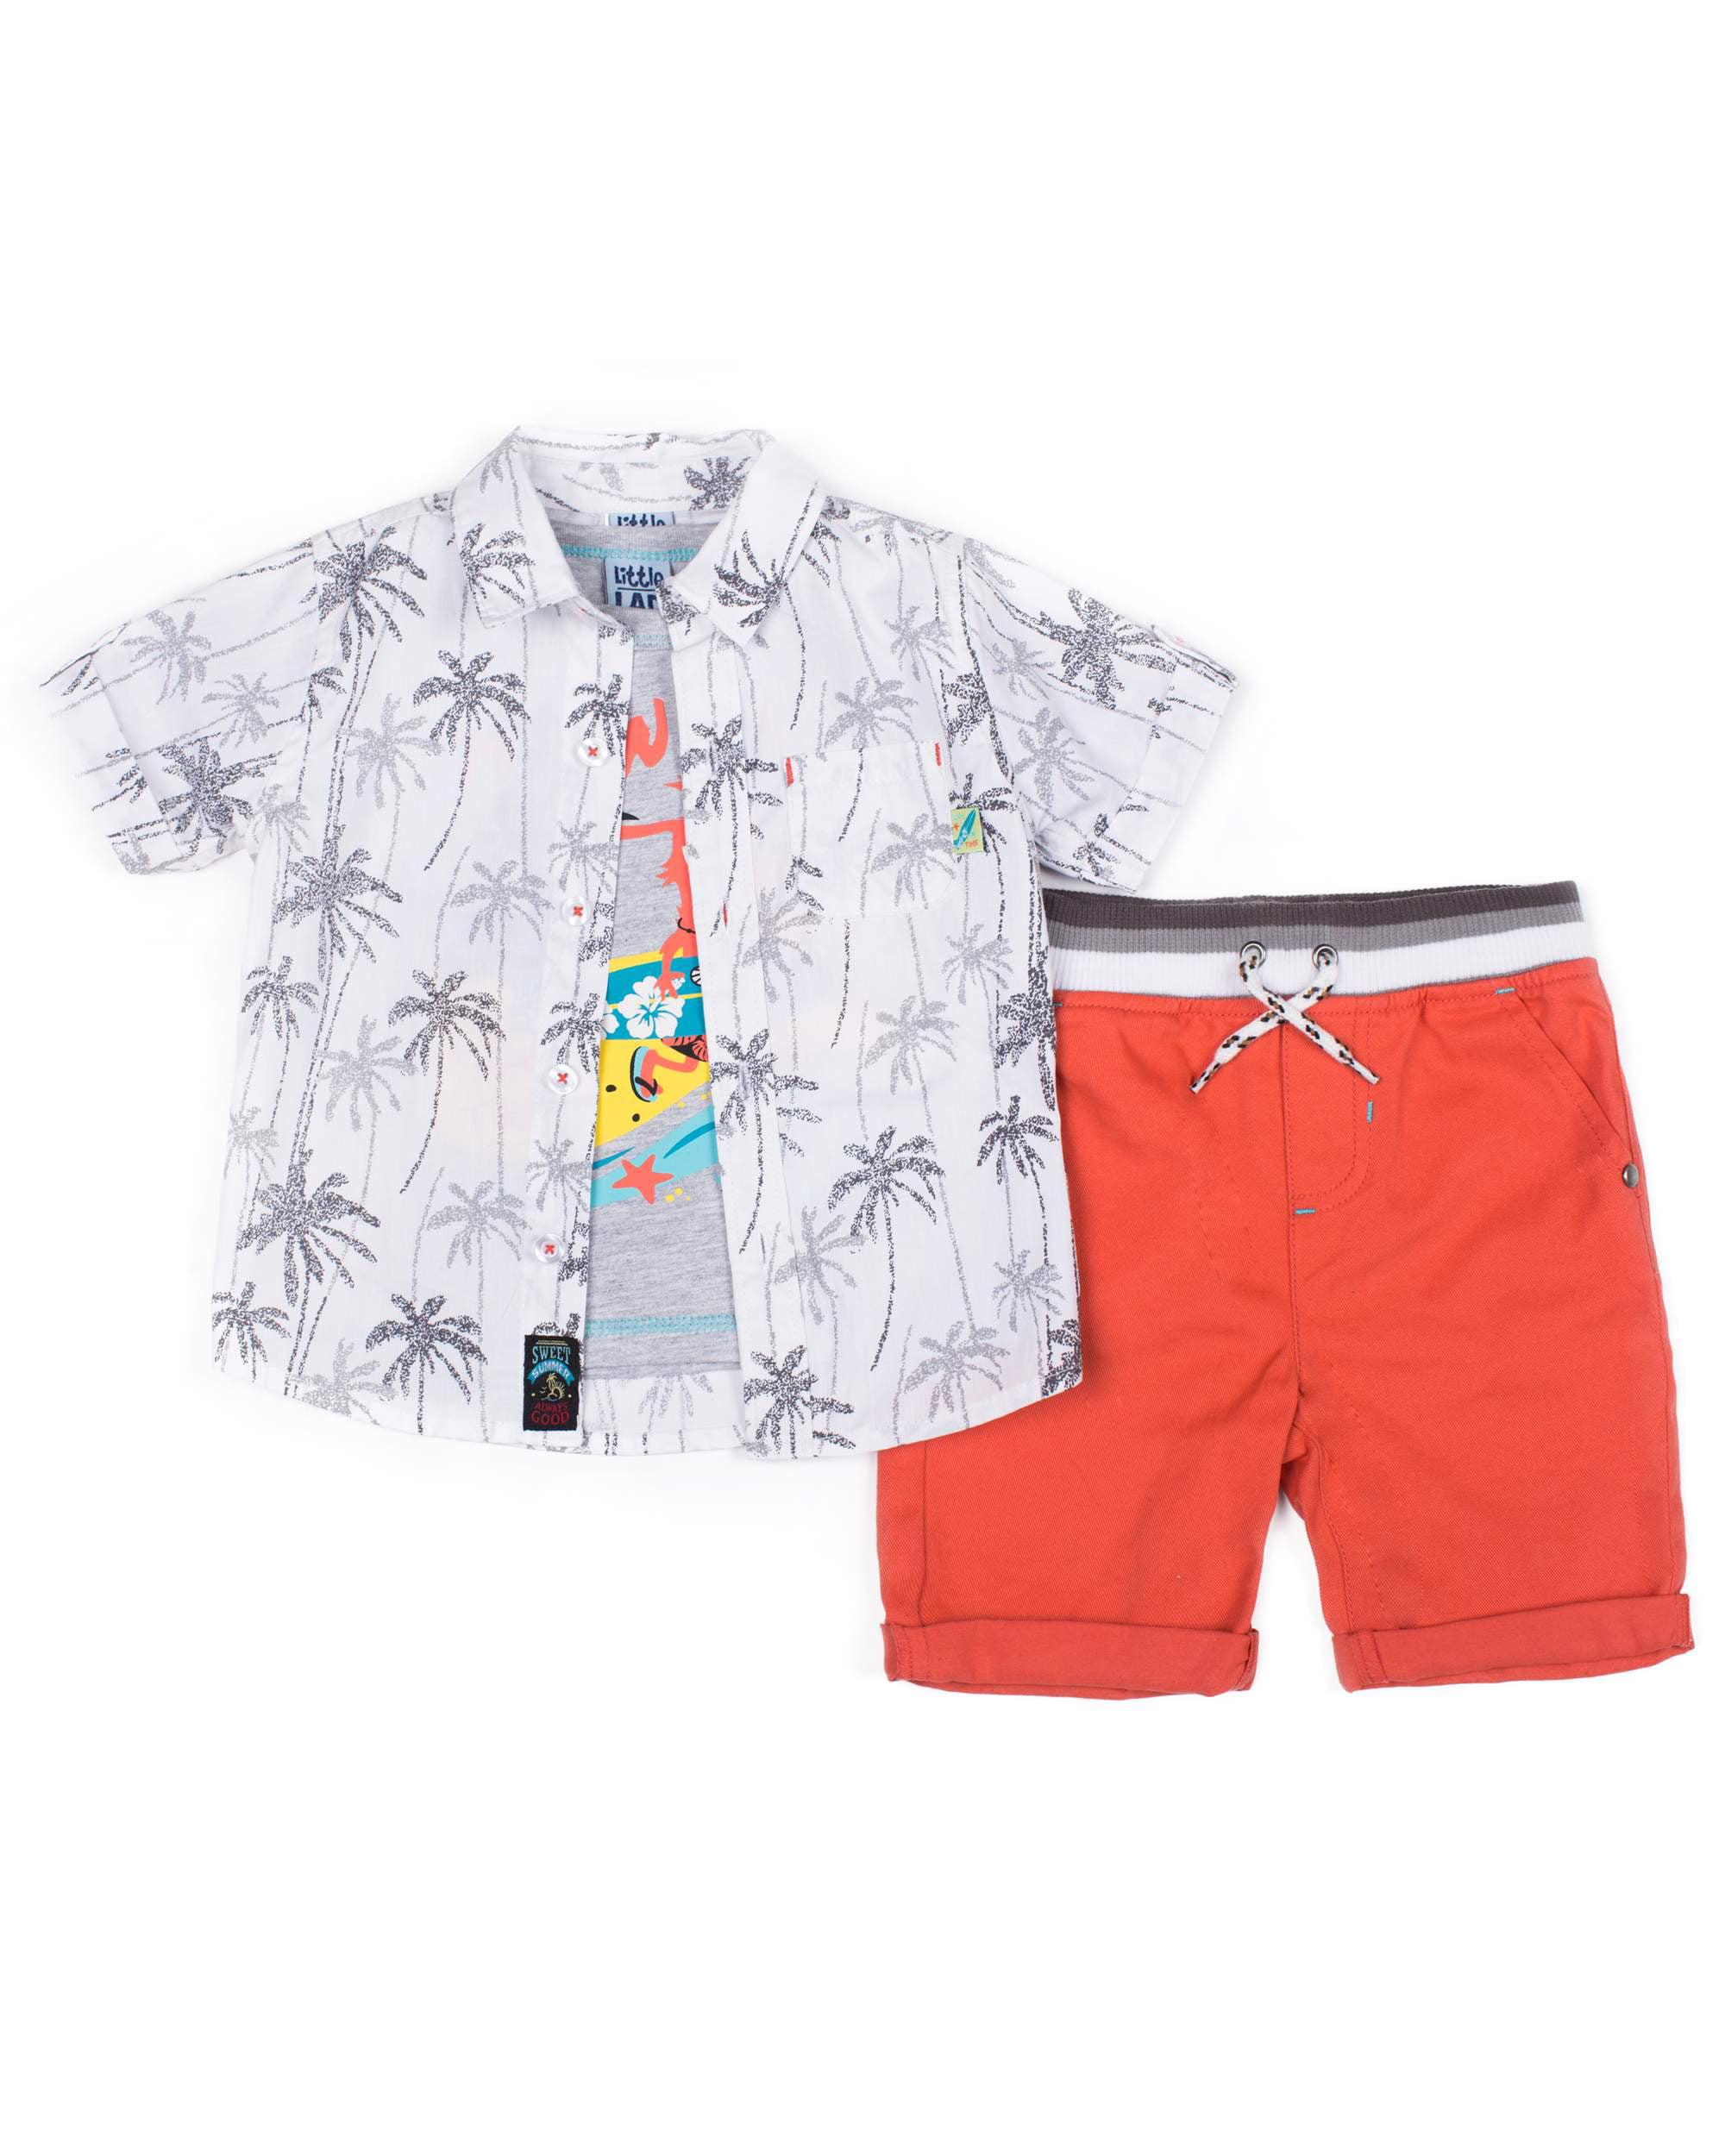 7ea9f3e17 Short Sleeve Printed Poplin Button Up Shirt, Short Sleeve Graphic T-shirt &  Drawstring Twill Short, 3pc Outfit Set (Baby Boys & Toddler Boys)